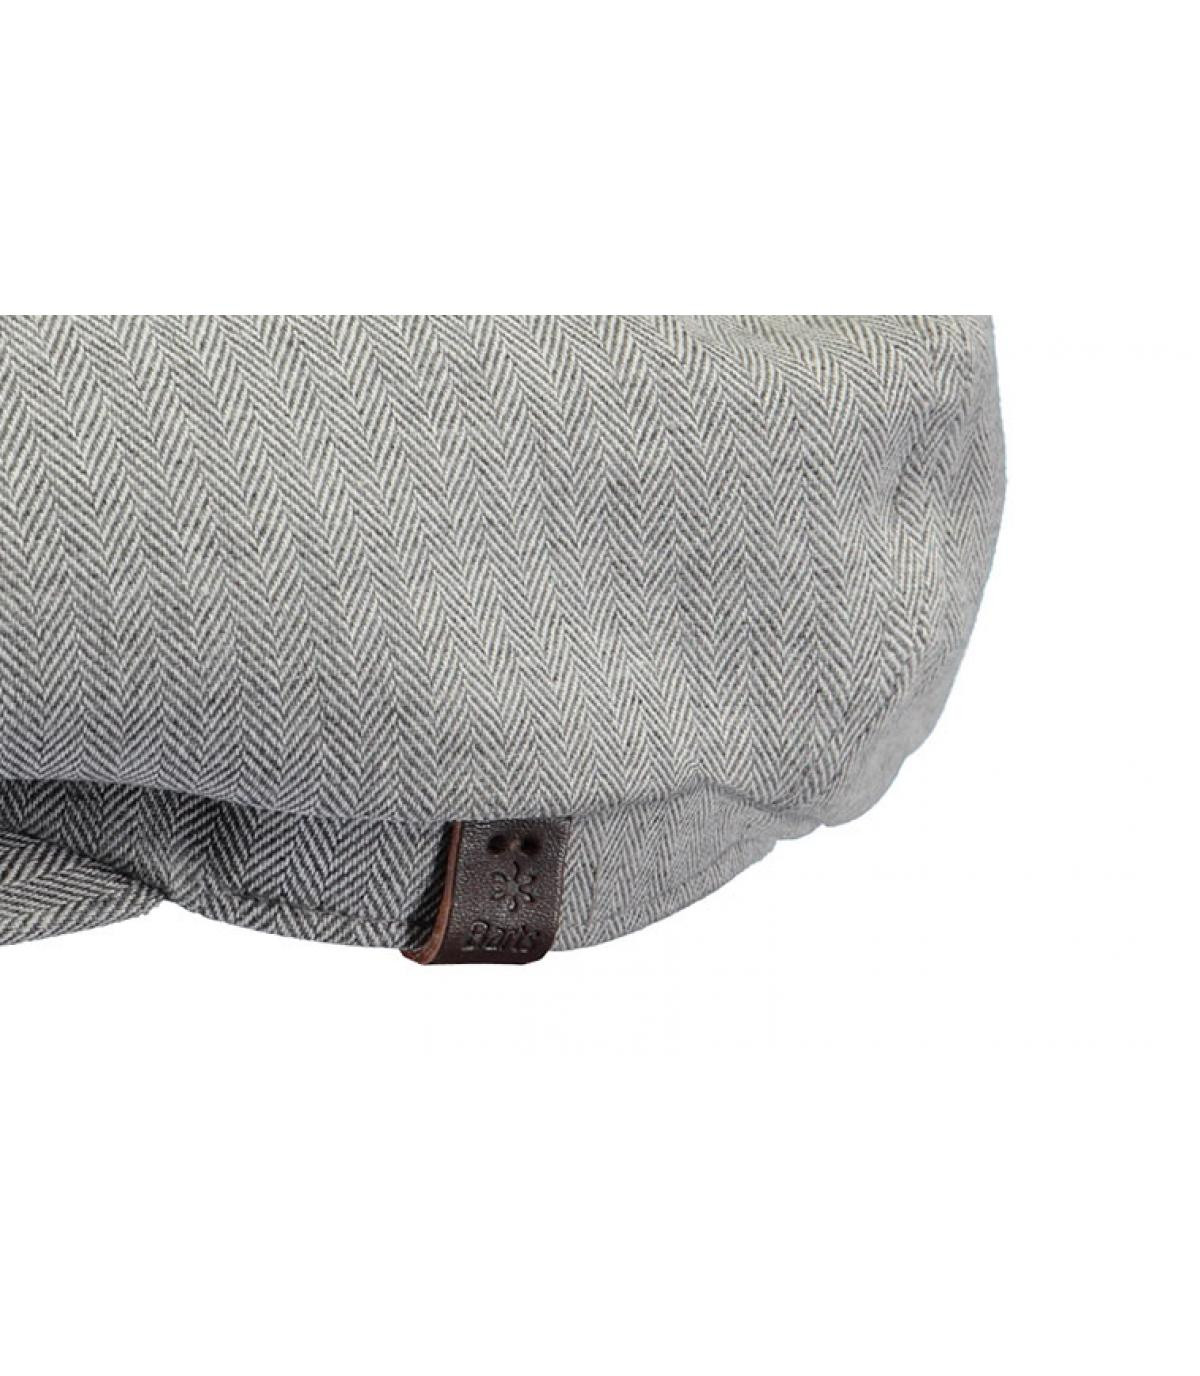 Details Jamiaca grey - Abbildung 3